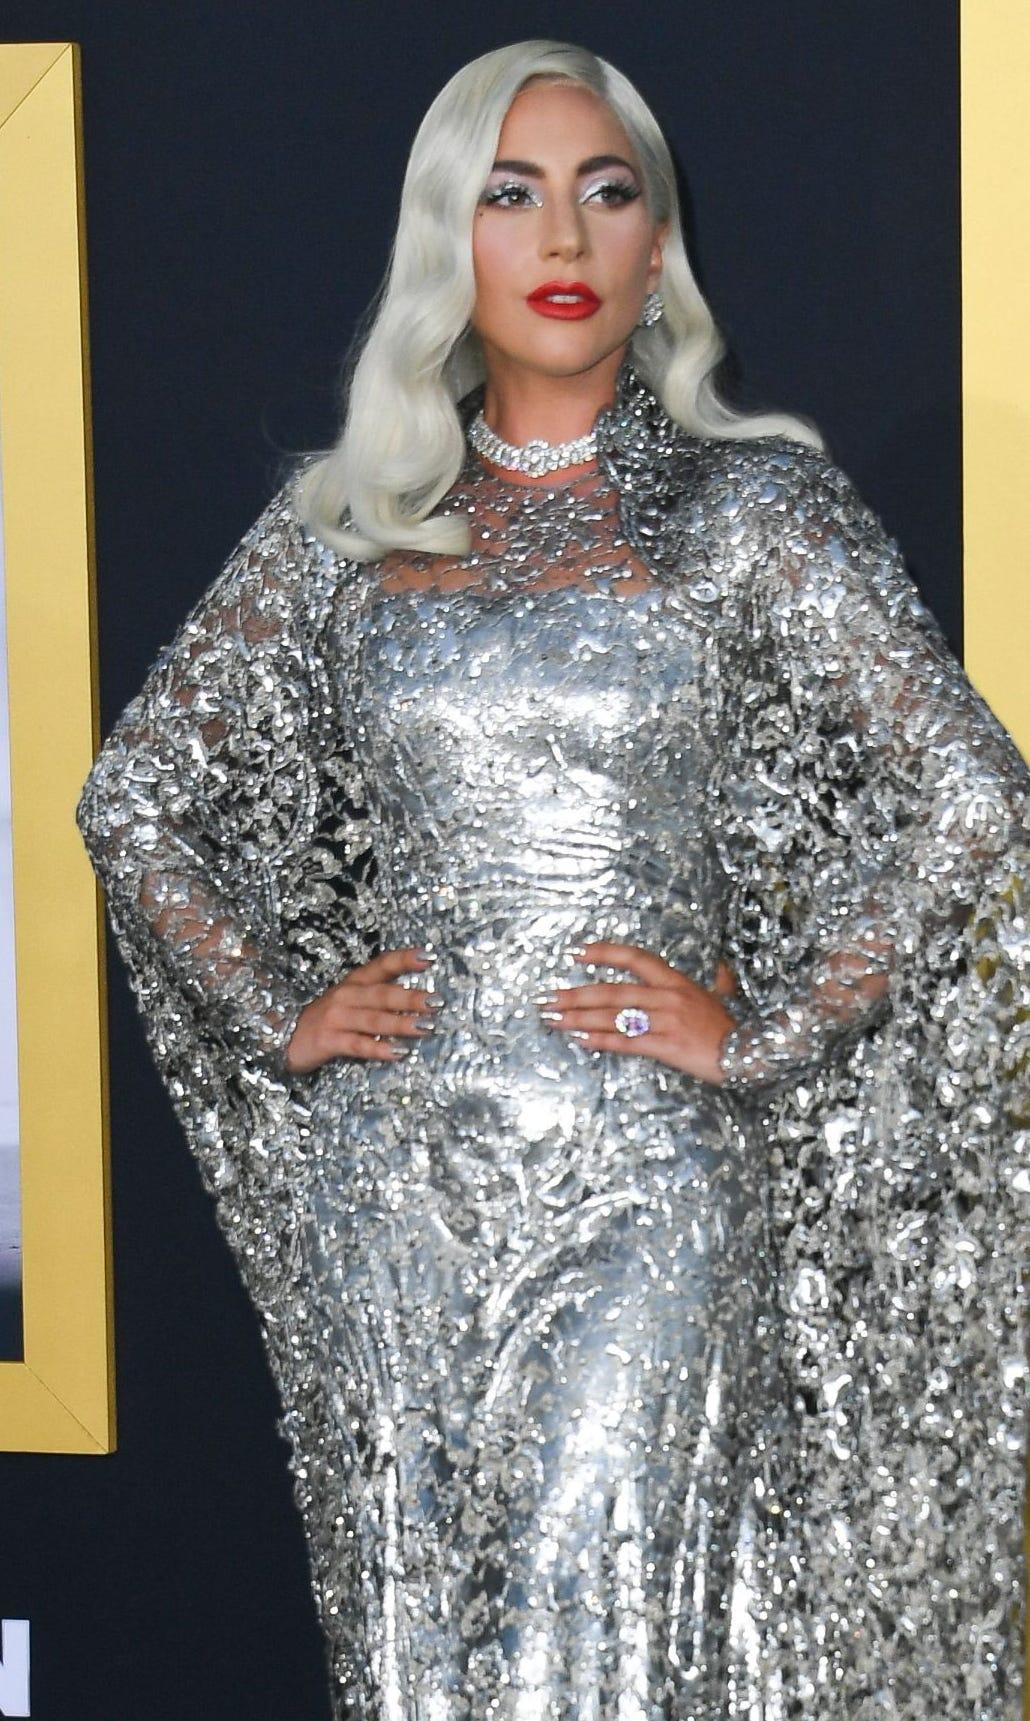 Lady Gaga Profile Image